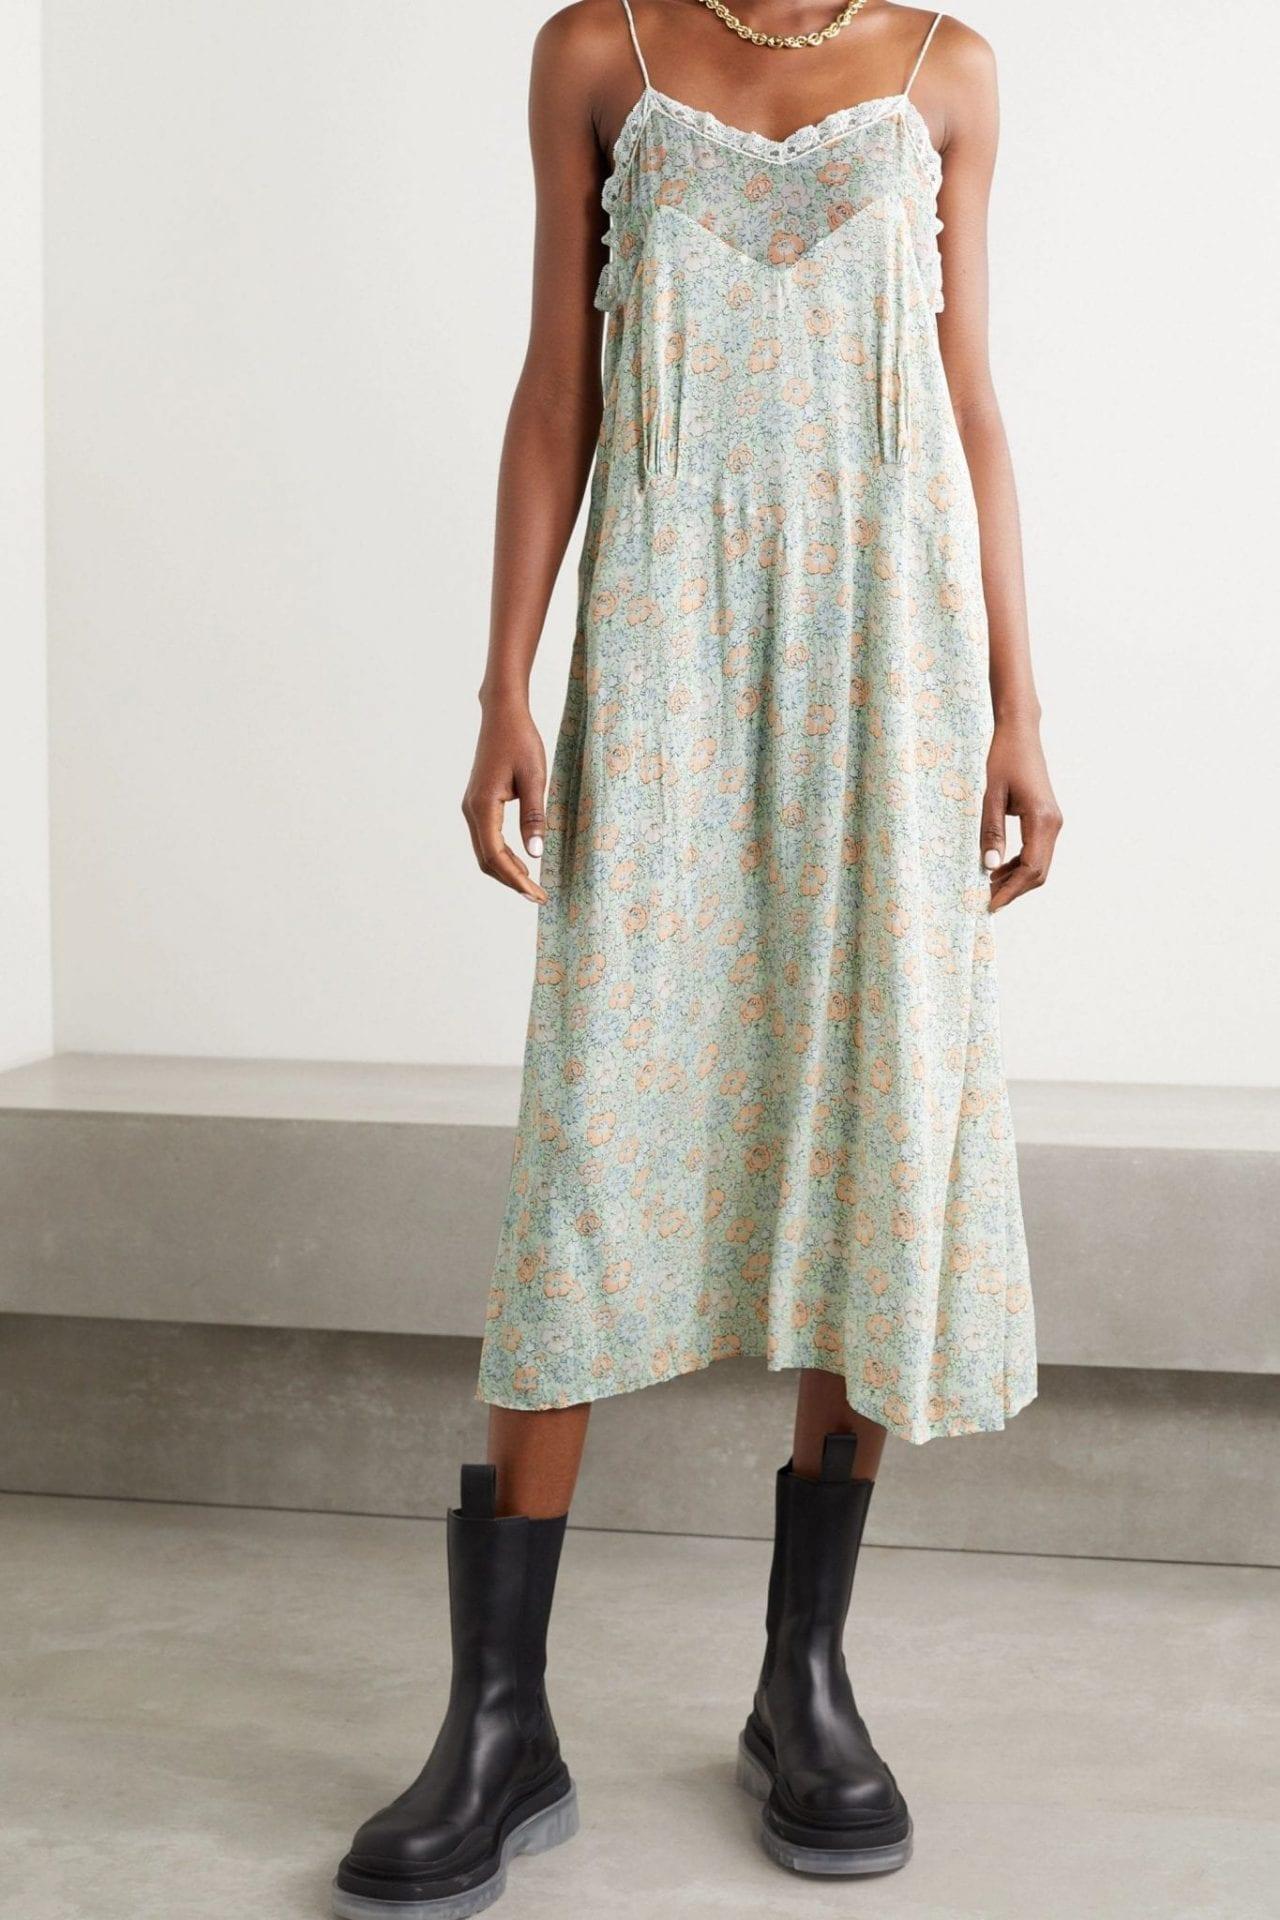 GUCCI + Liberty London Silk-chiffon And Lace-trimmed Floral-print Crepe Midi Dress